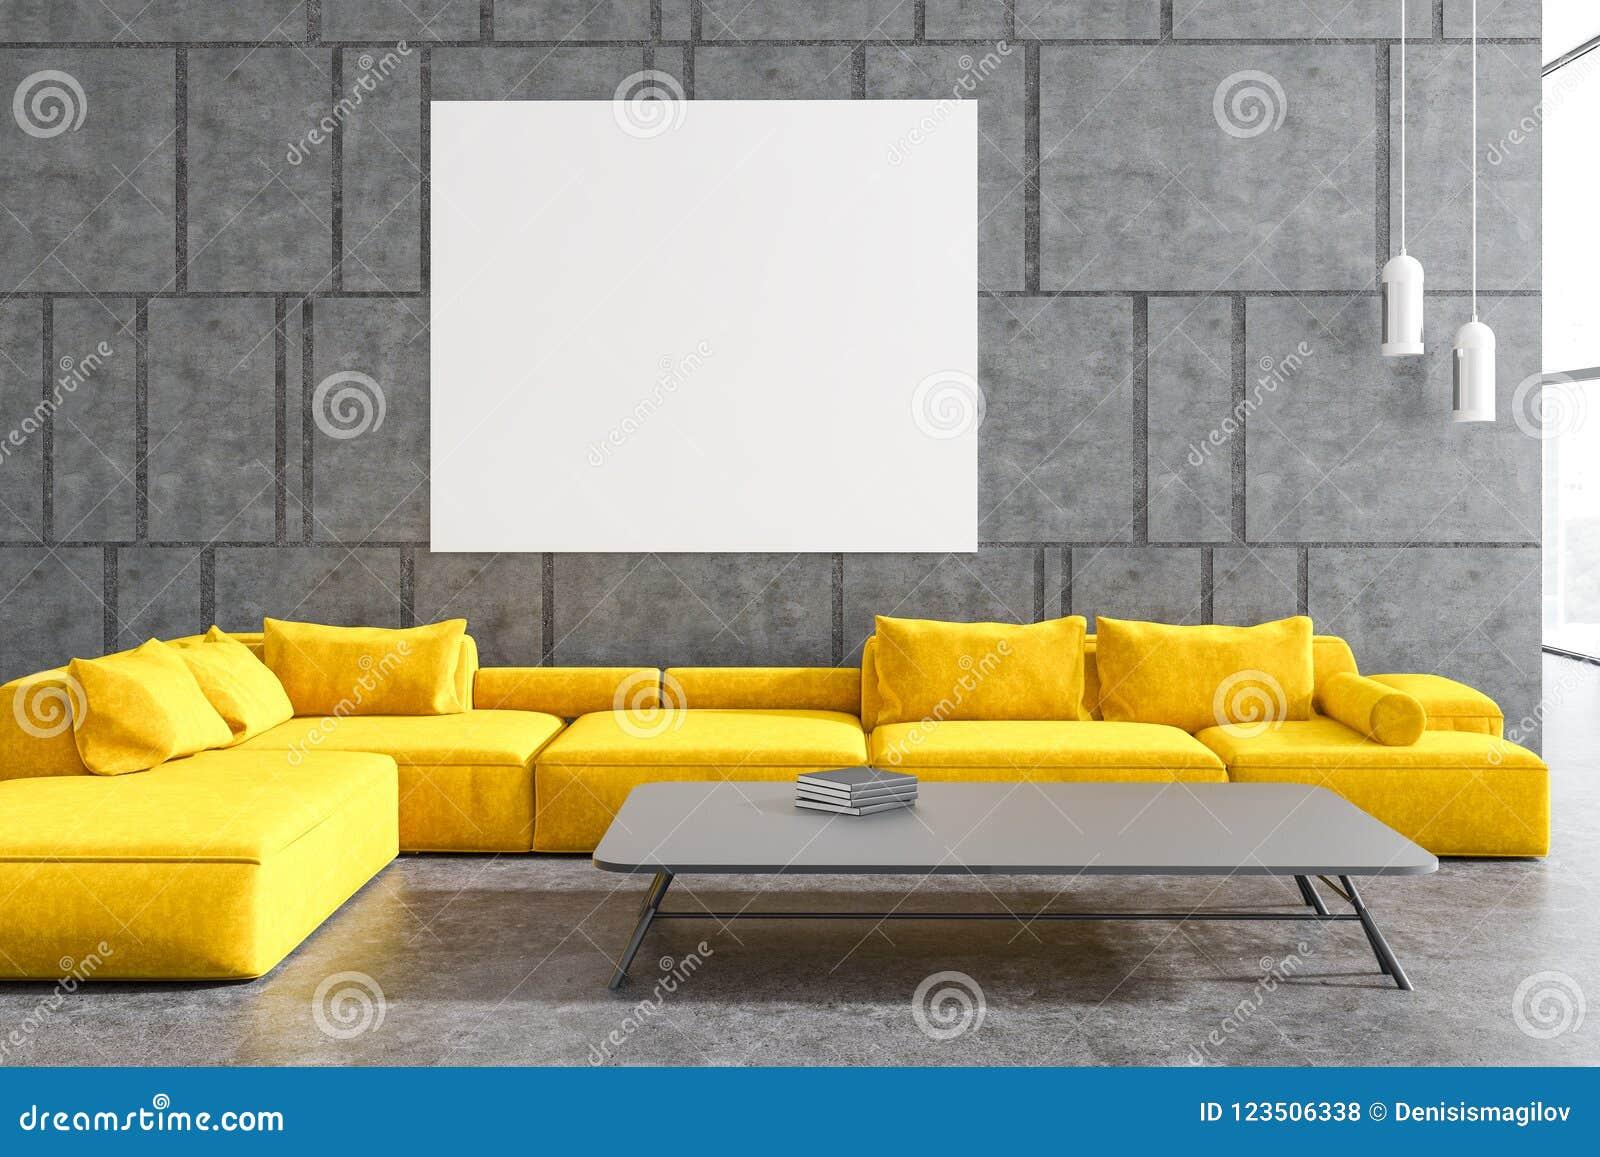 Gray Living Room, Yellow Sofa, Poster Stock Illustration ...